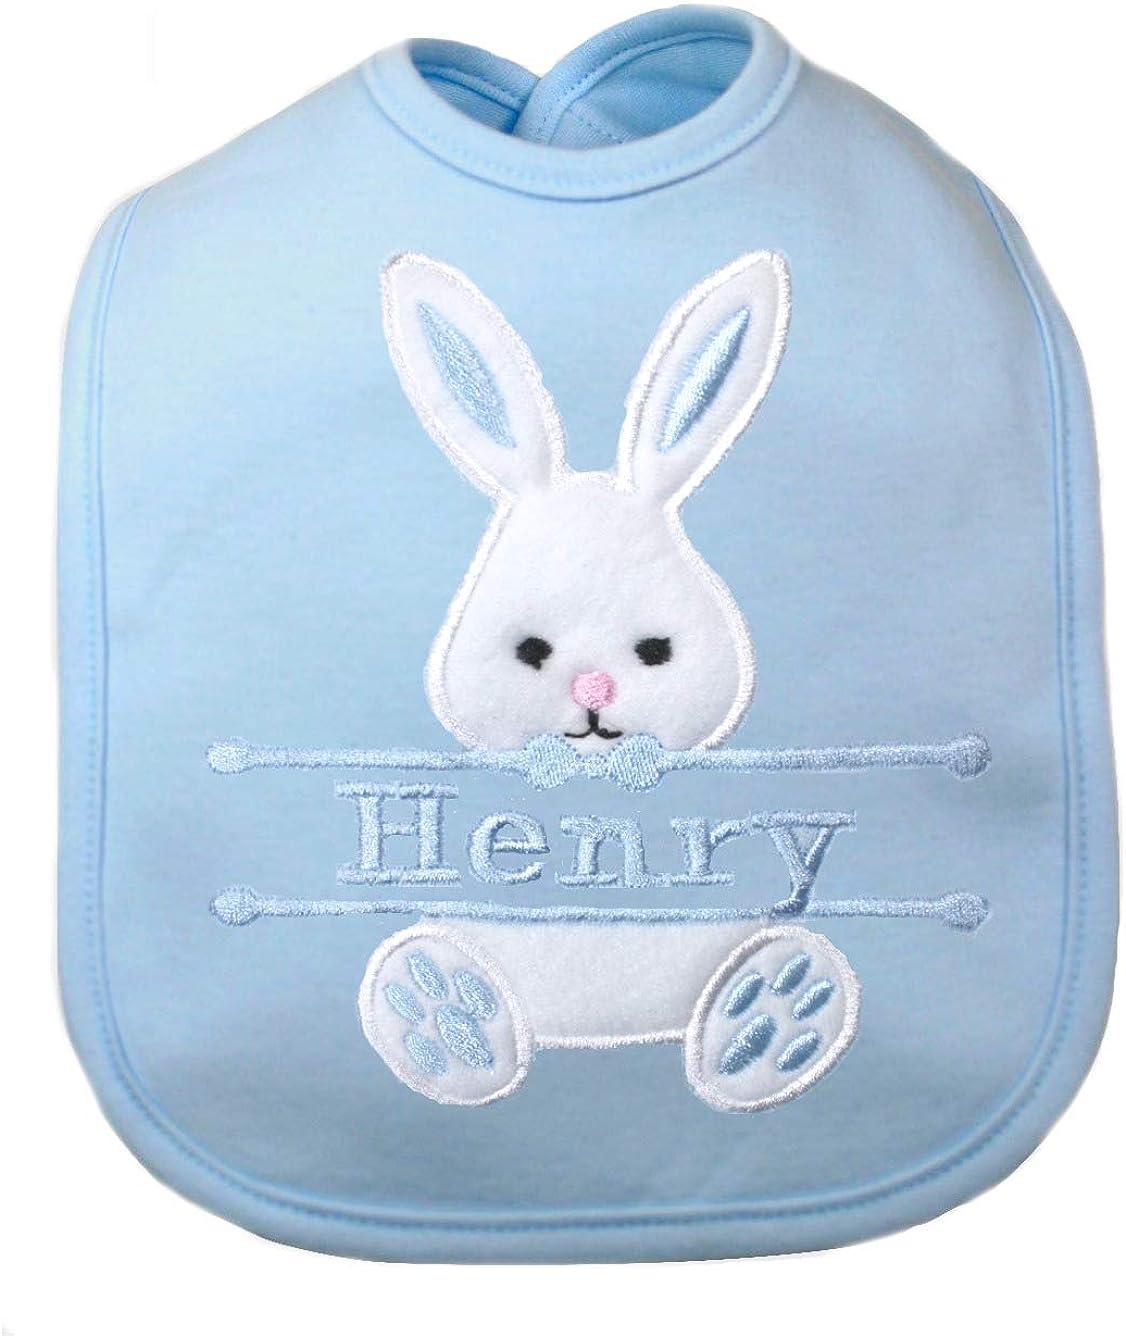 Personalised Peter Rabbit 1st Easter Baby Bib 1st Easter a perfect baby gift Easter Gift